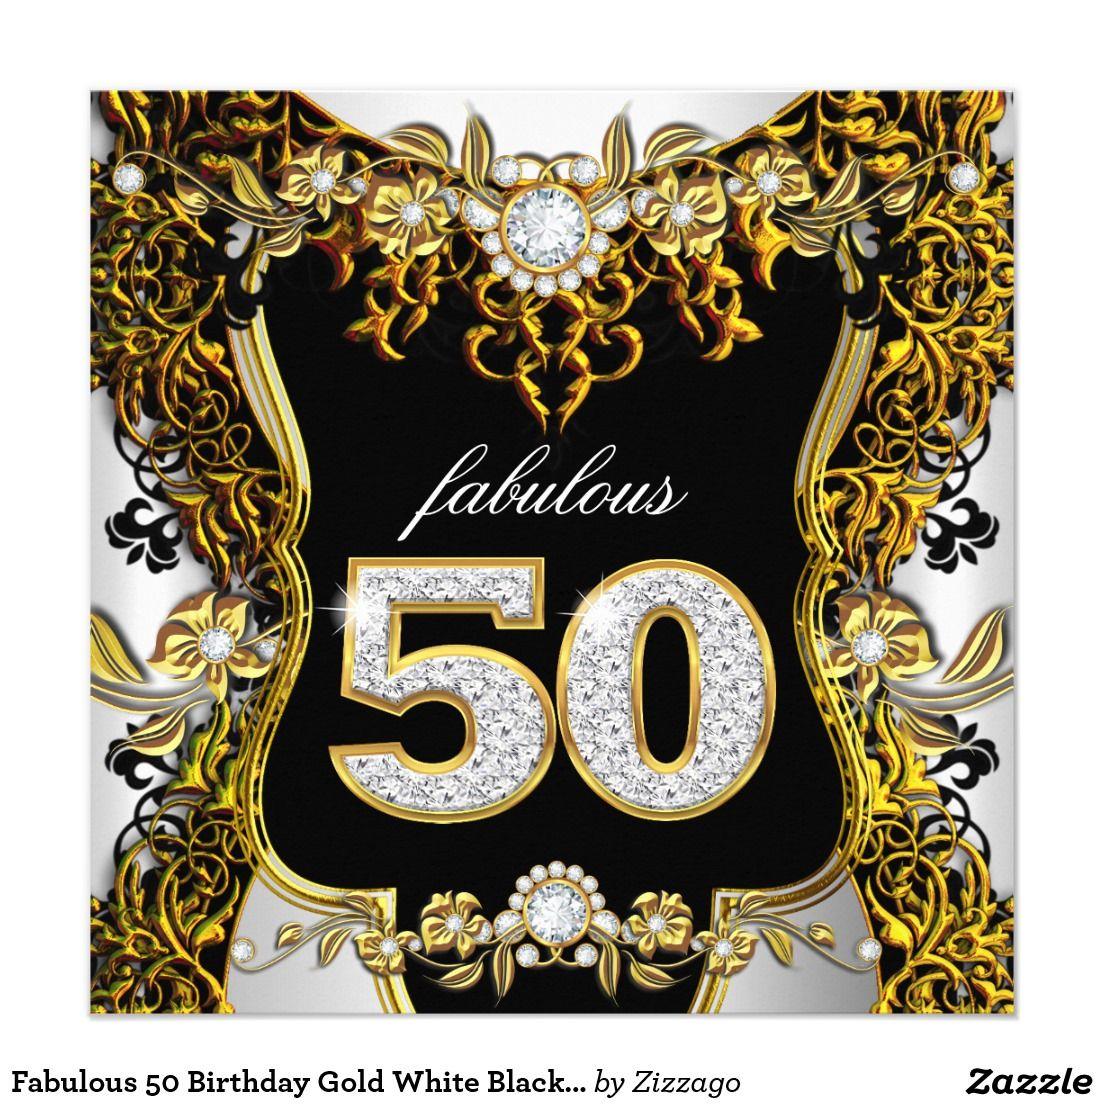 Fab 50 Birthday: Fabulous 50 Birthday Gold White Black Diamond Invitation